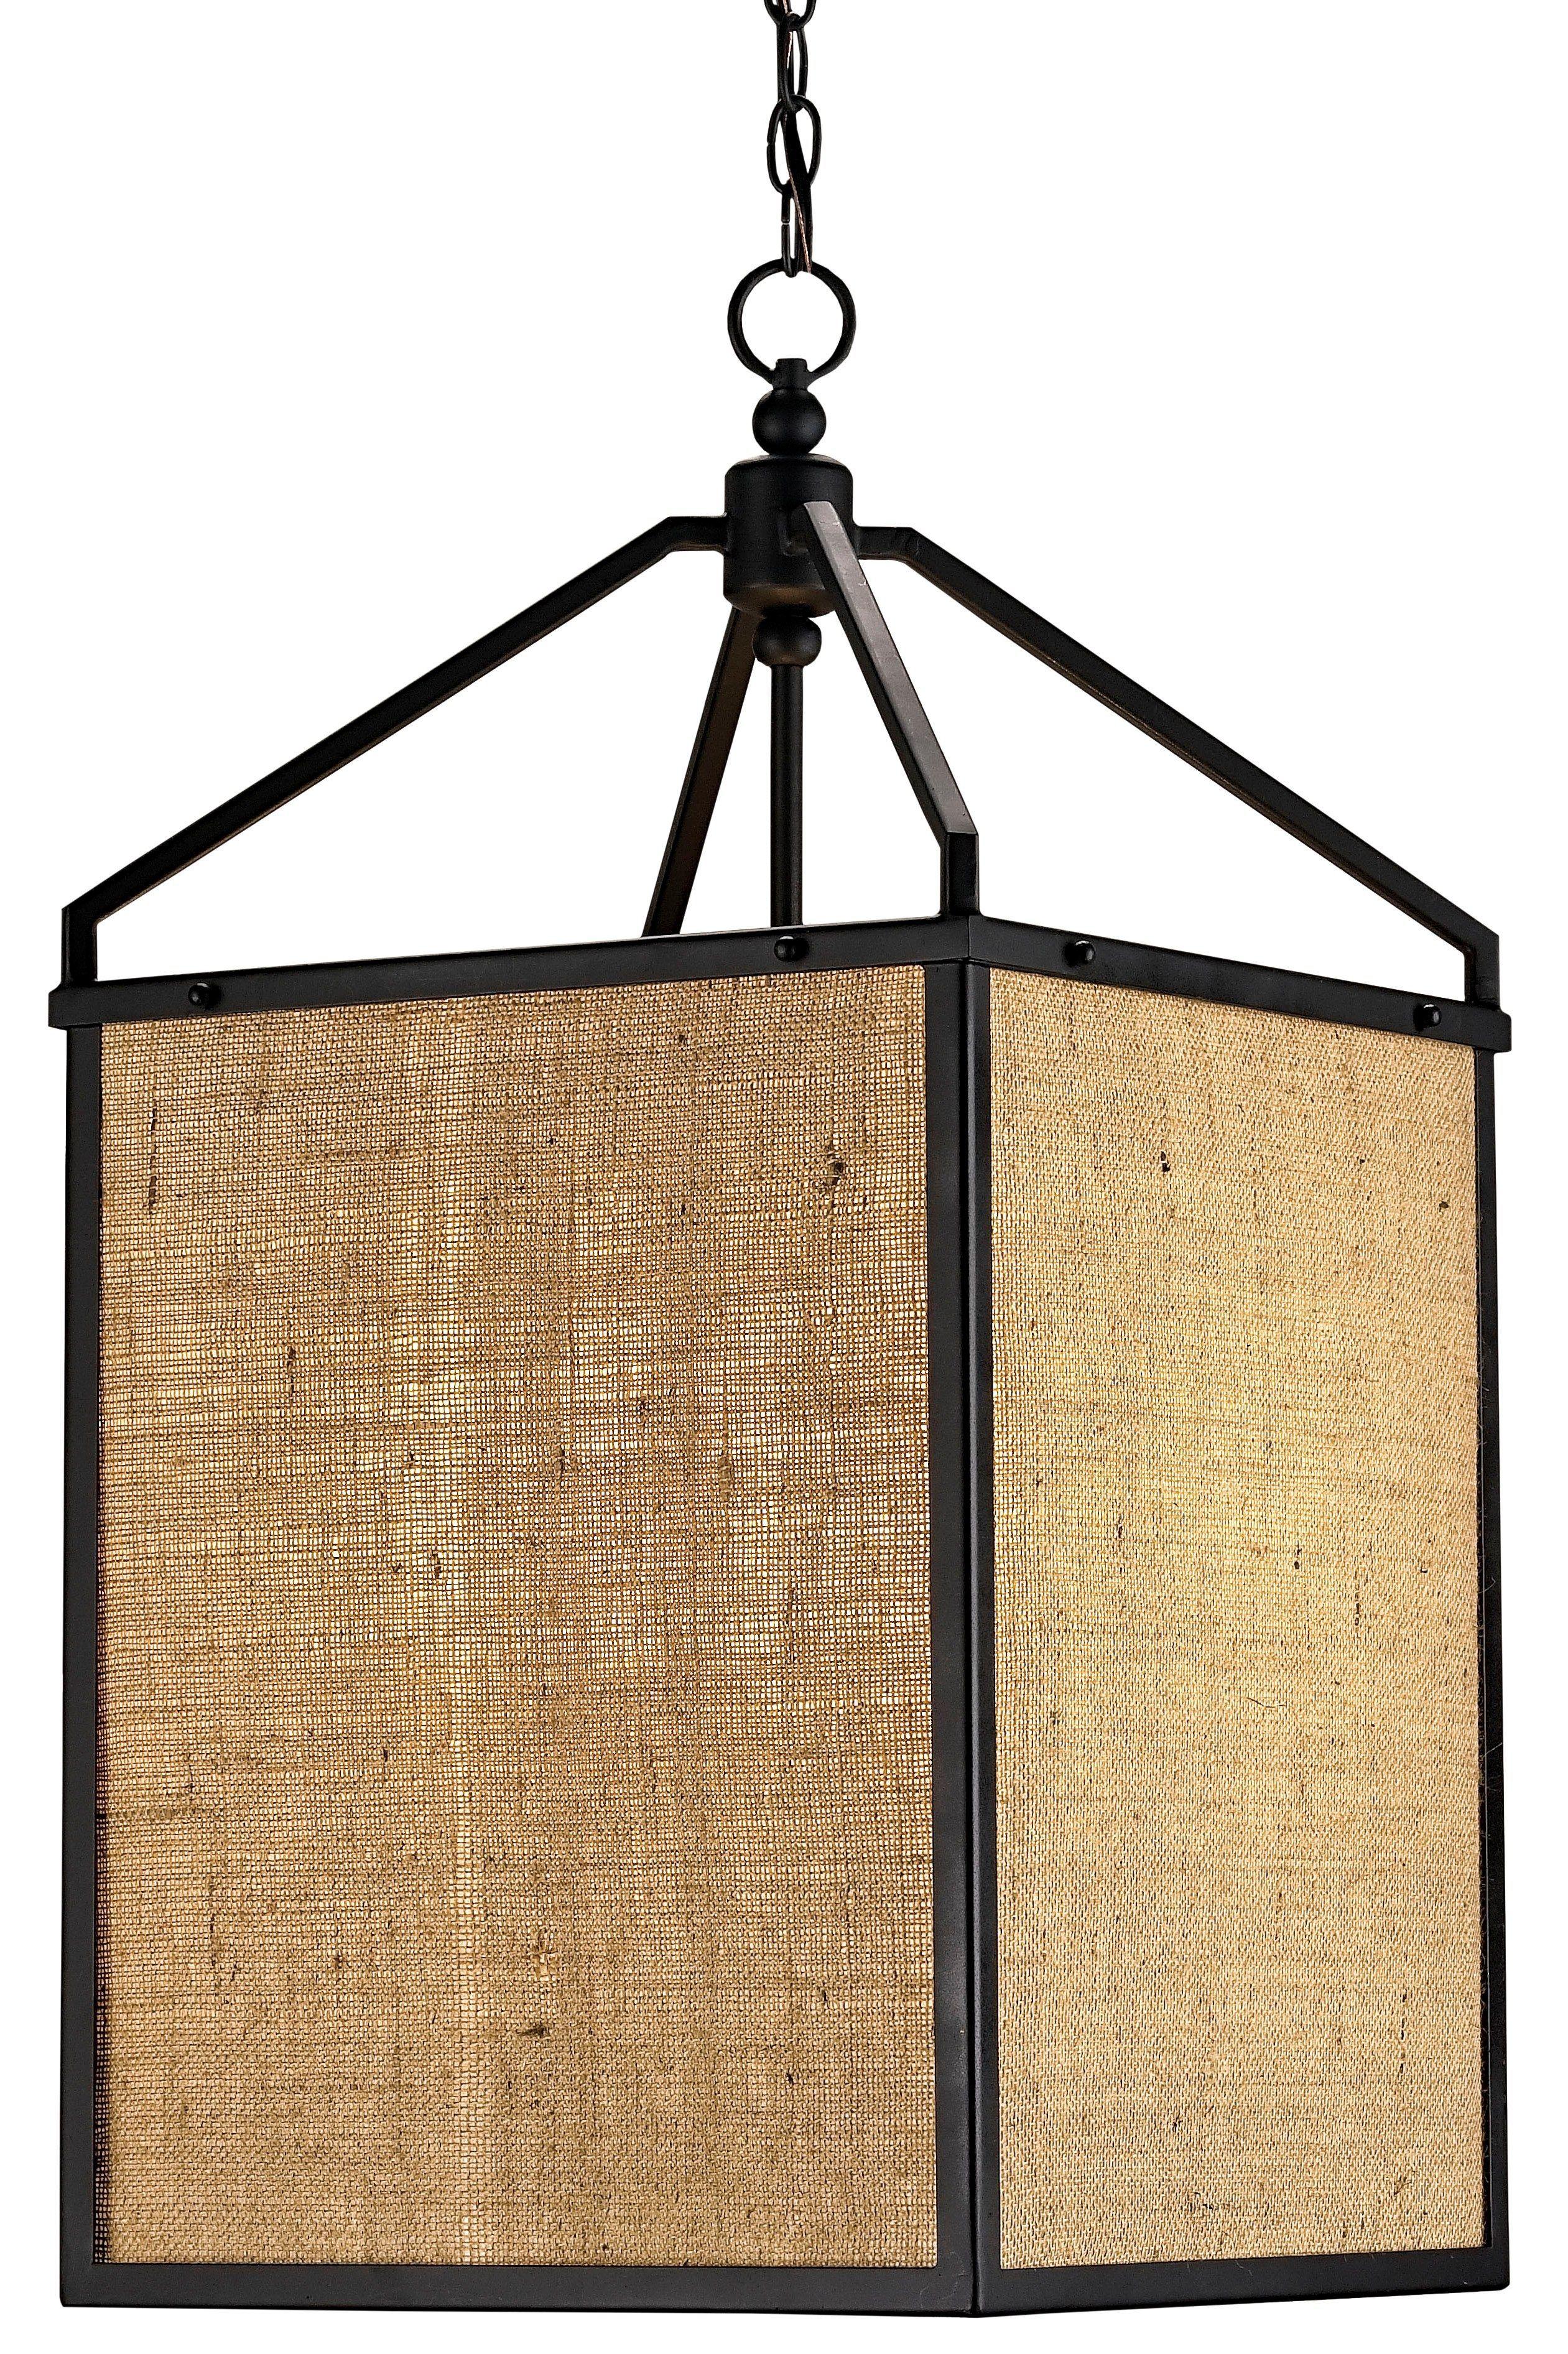 Wiggins Lantern Antique Lamp Shades Wall Lamp Shades Asian